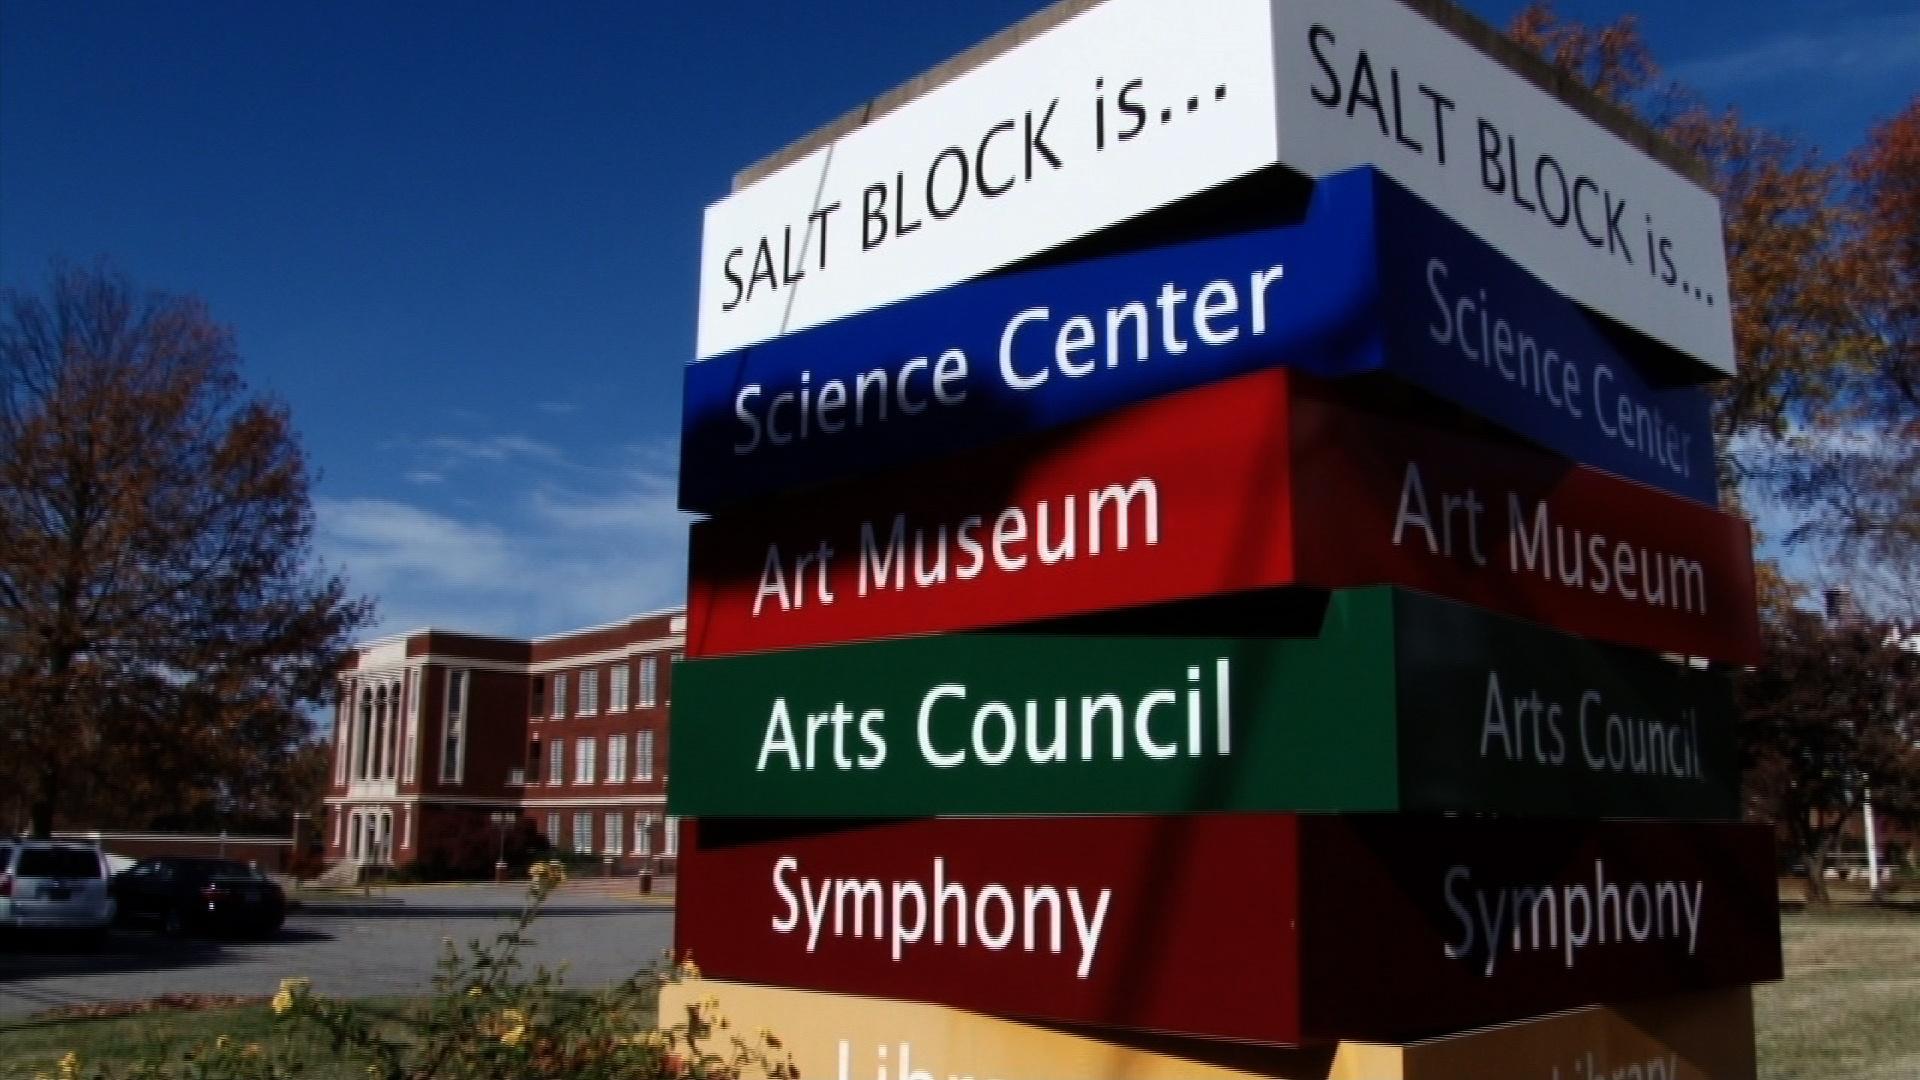 Hickory SALT Block image